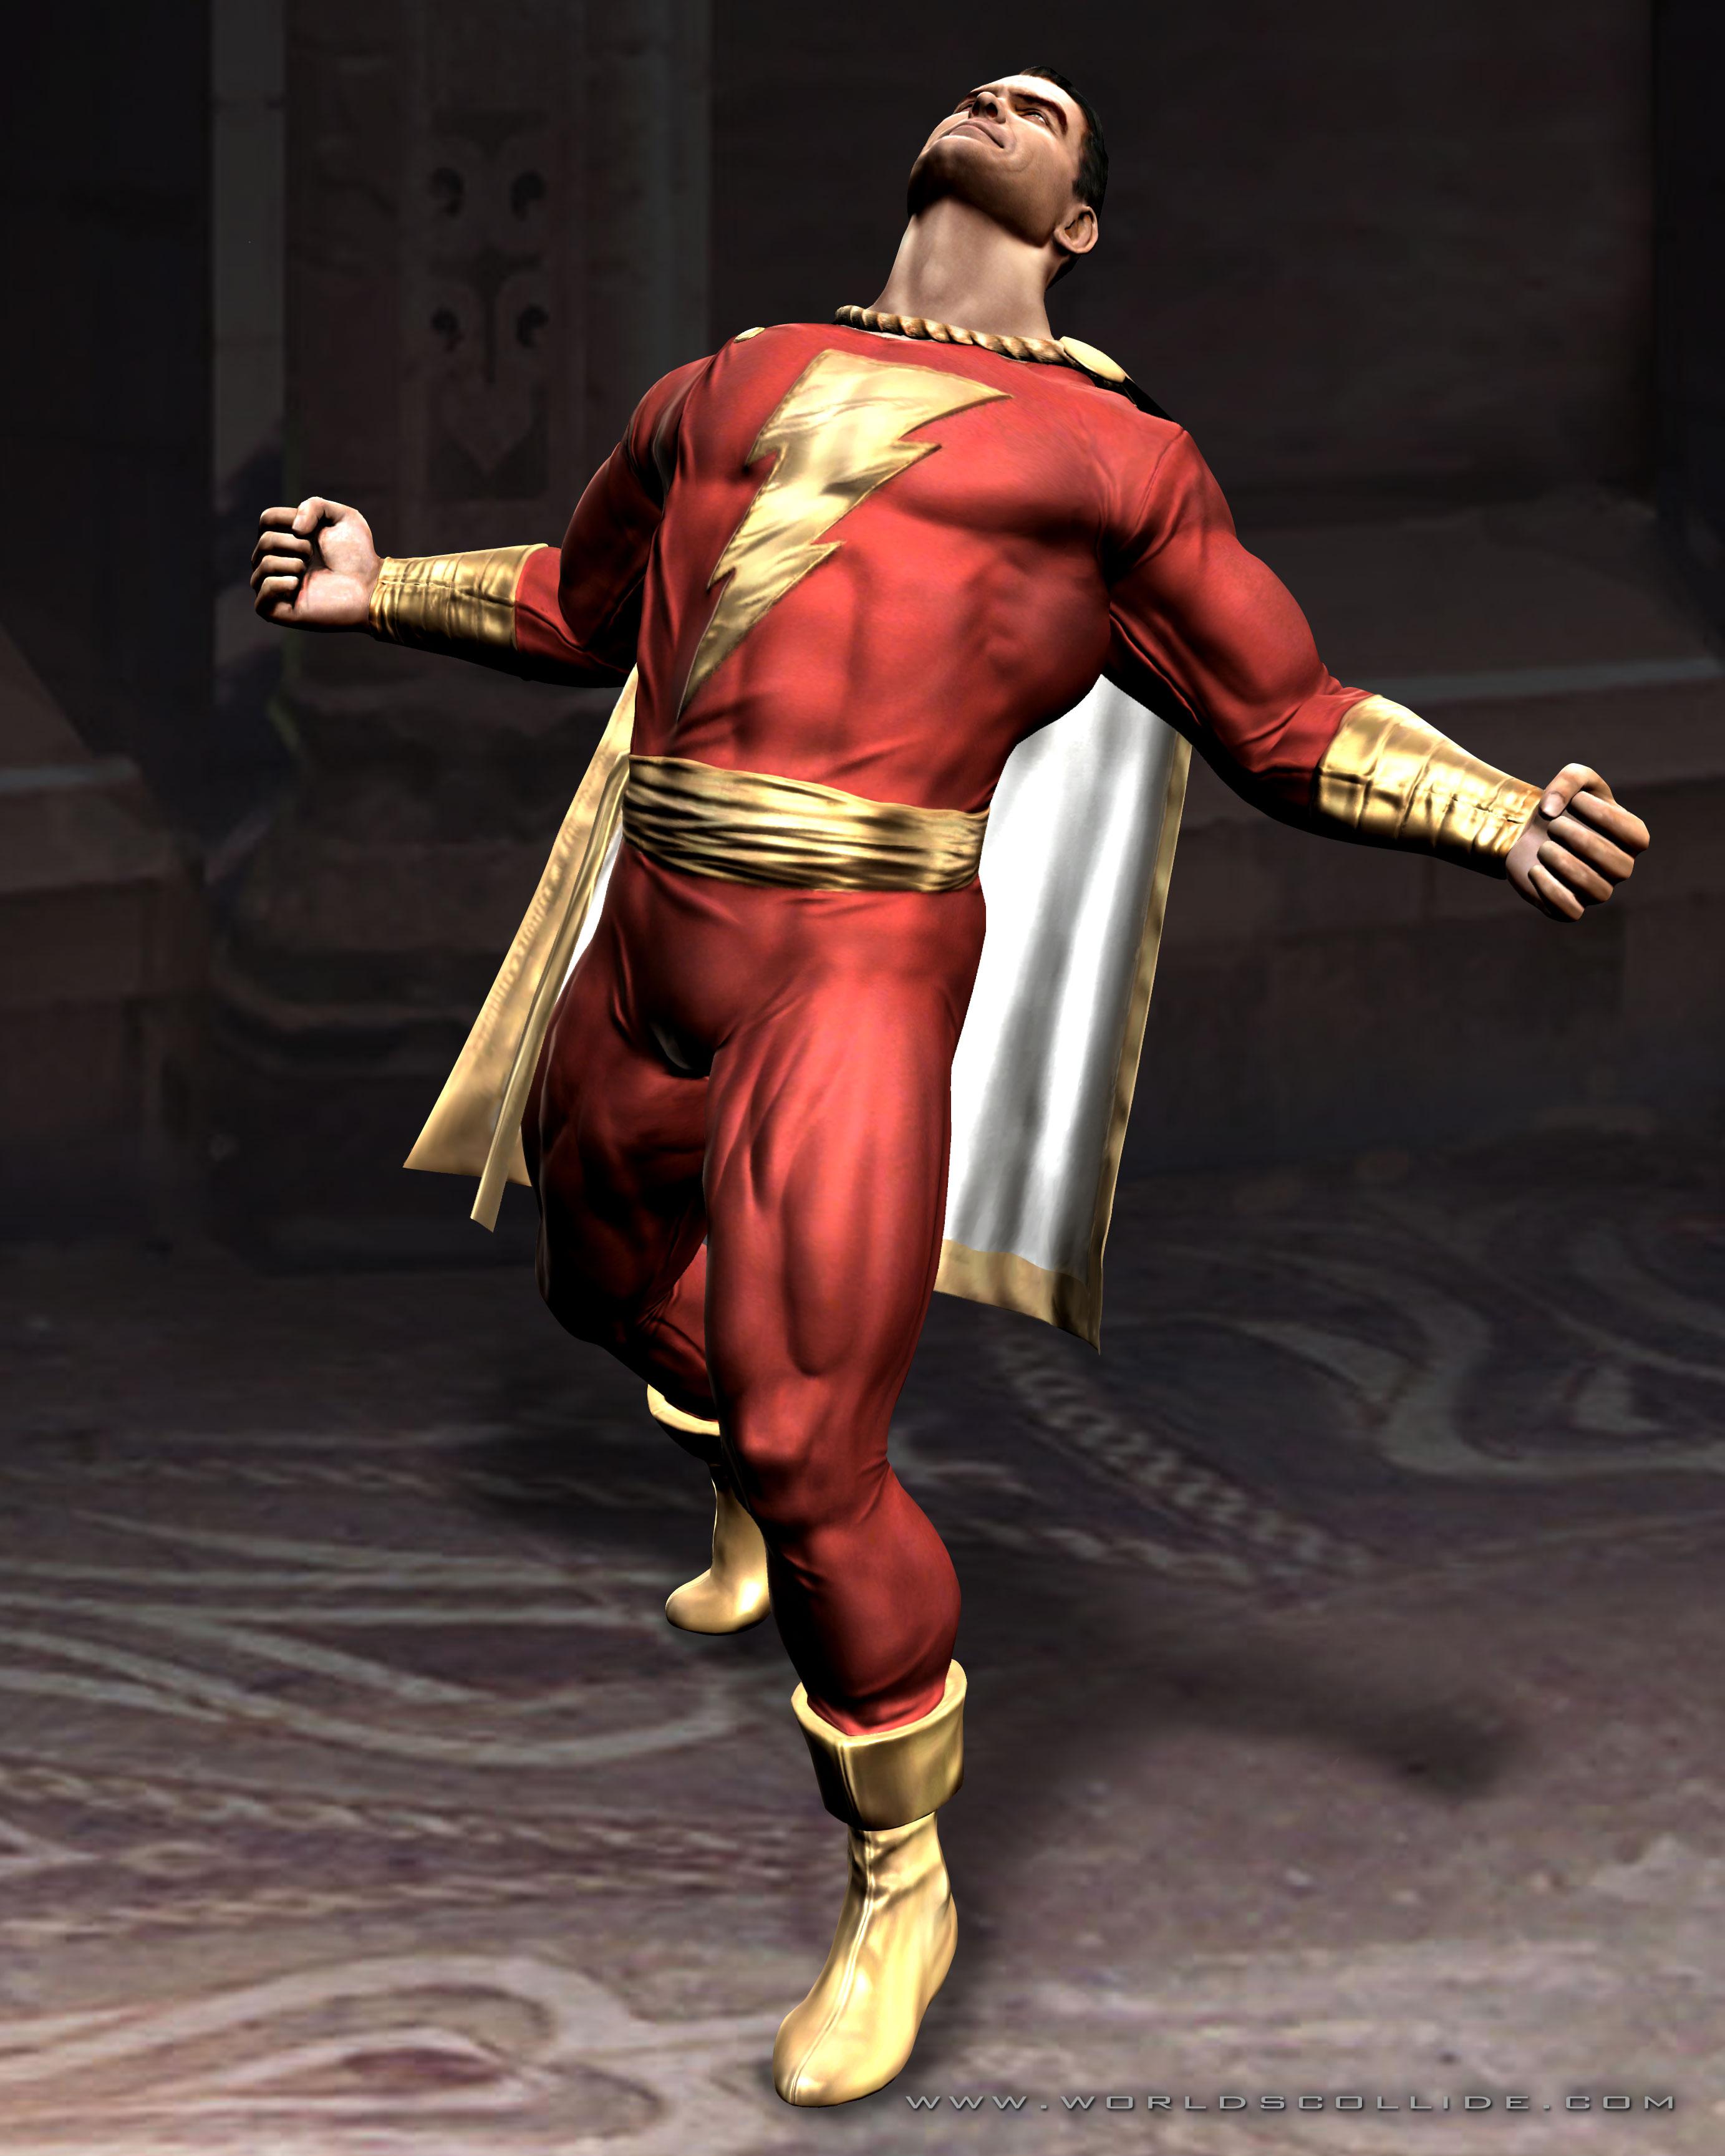 William Batson Mortal Kombat Vs DC Universe